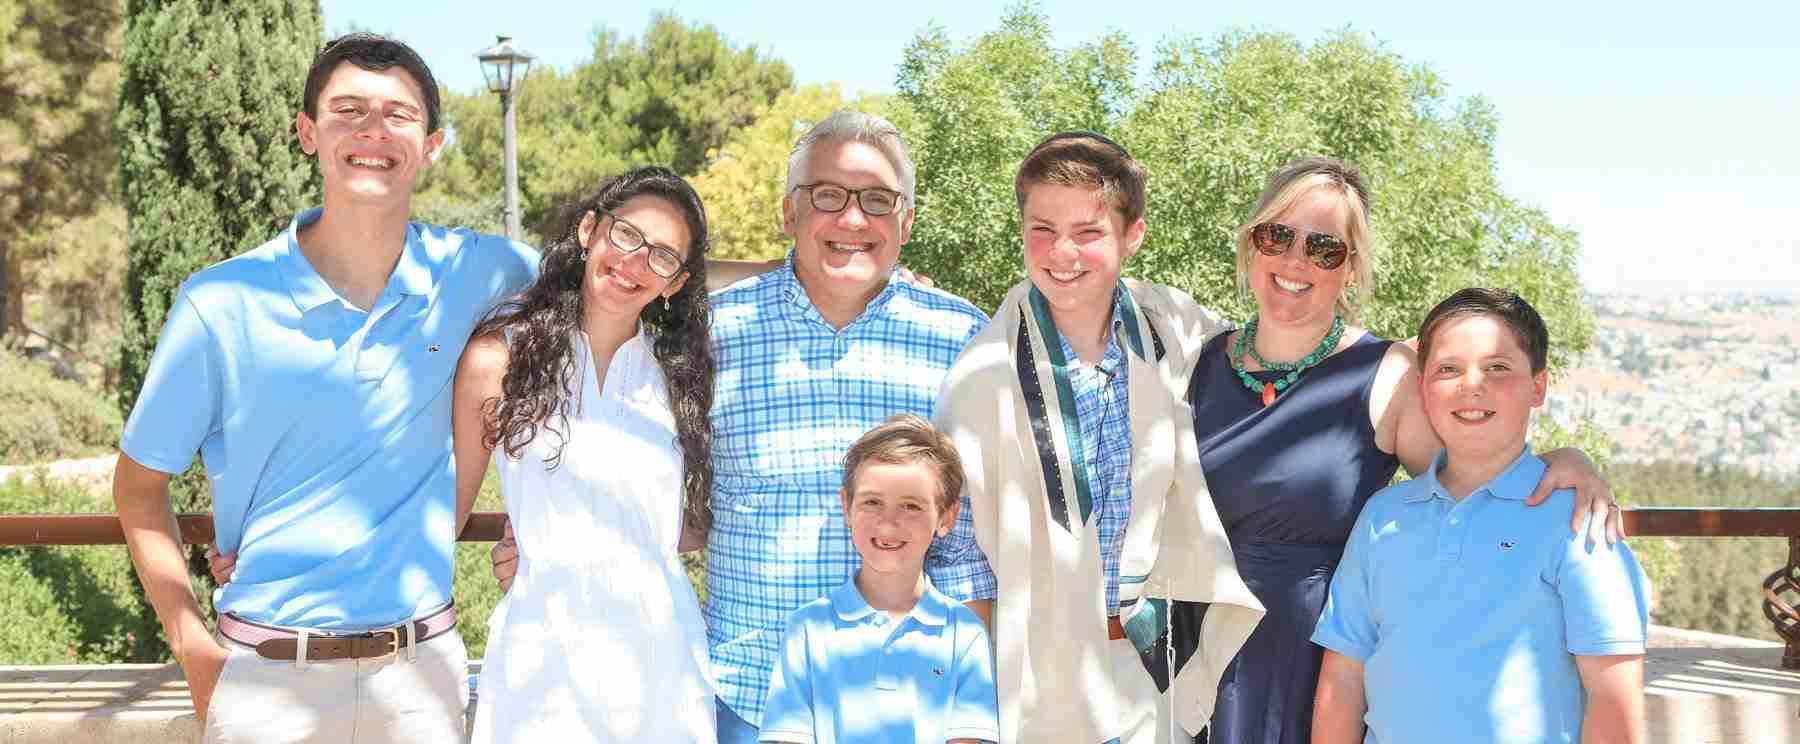 bar mitzvah tours at the holy land